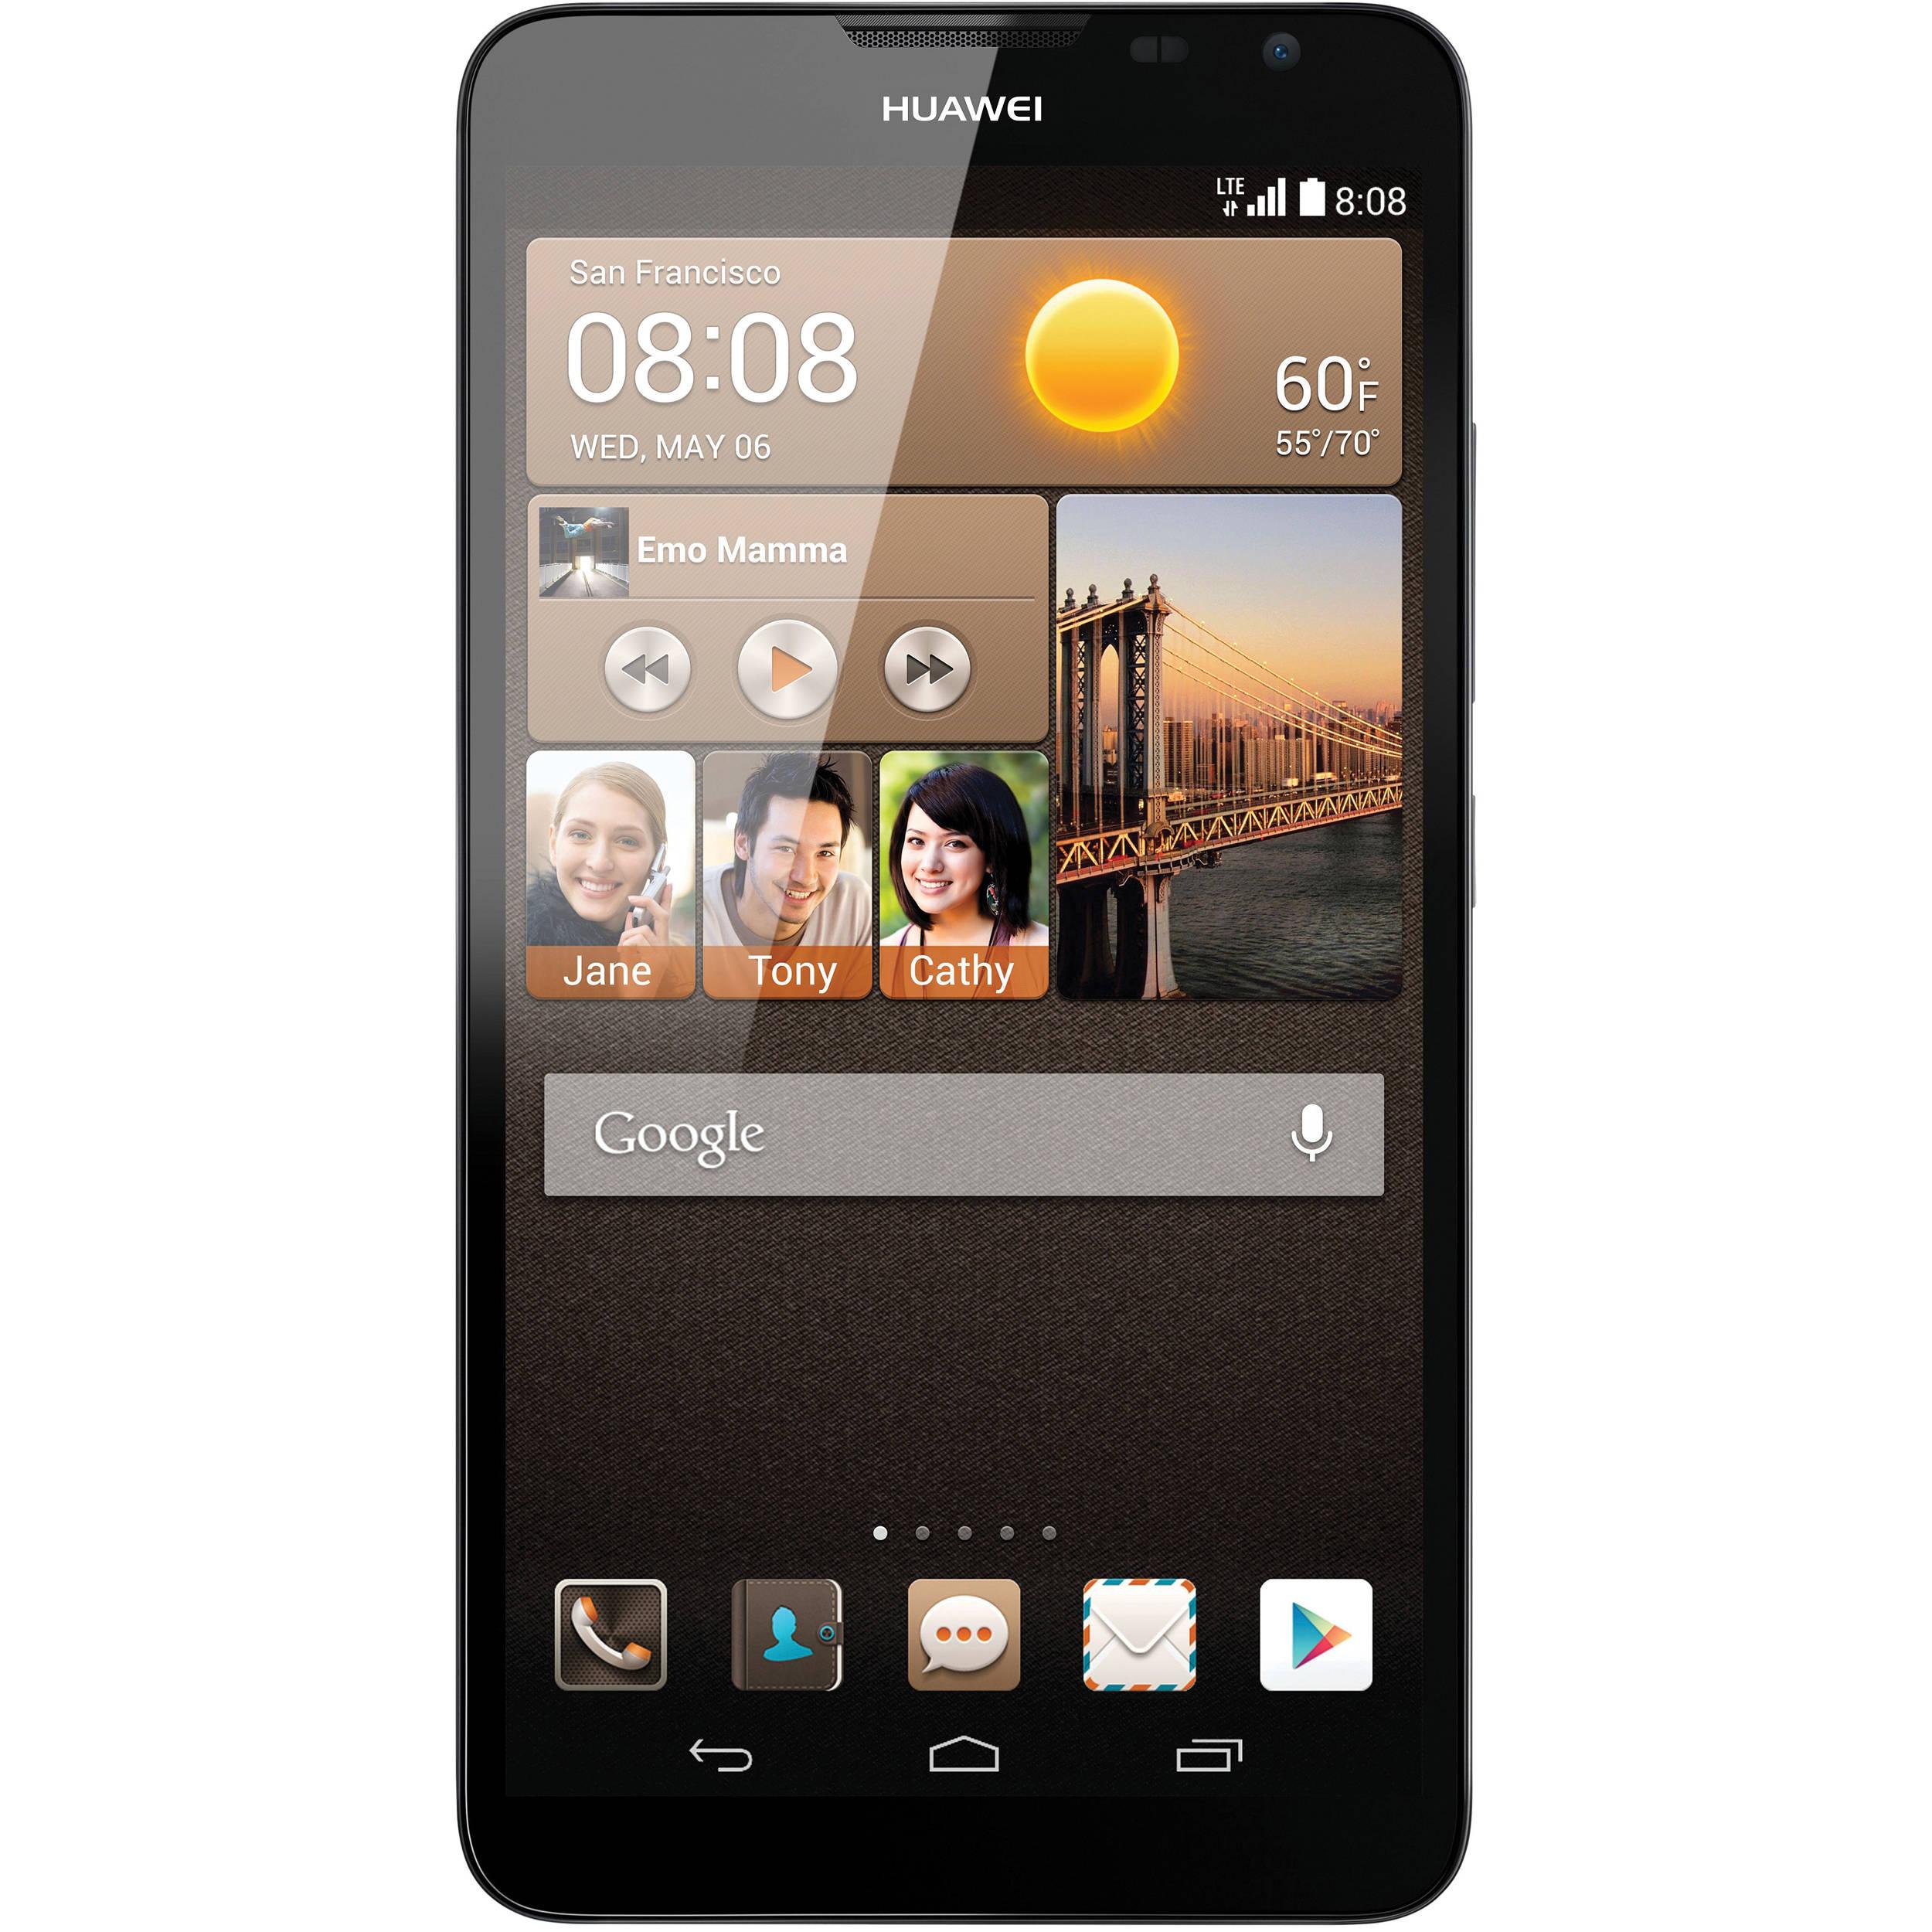 huawei phone straight talk. huawei ascend mate2 mt2-l03 4g 16gb smartphone (unlocked, black) phone straight talk